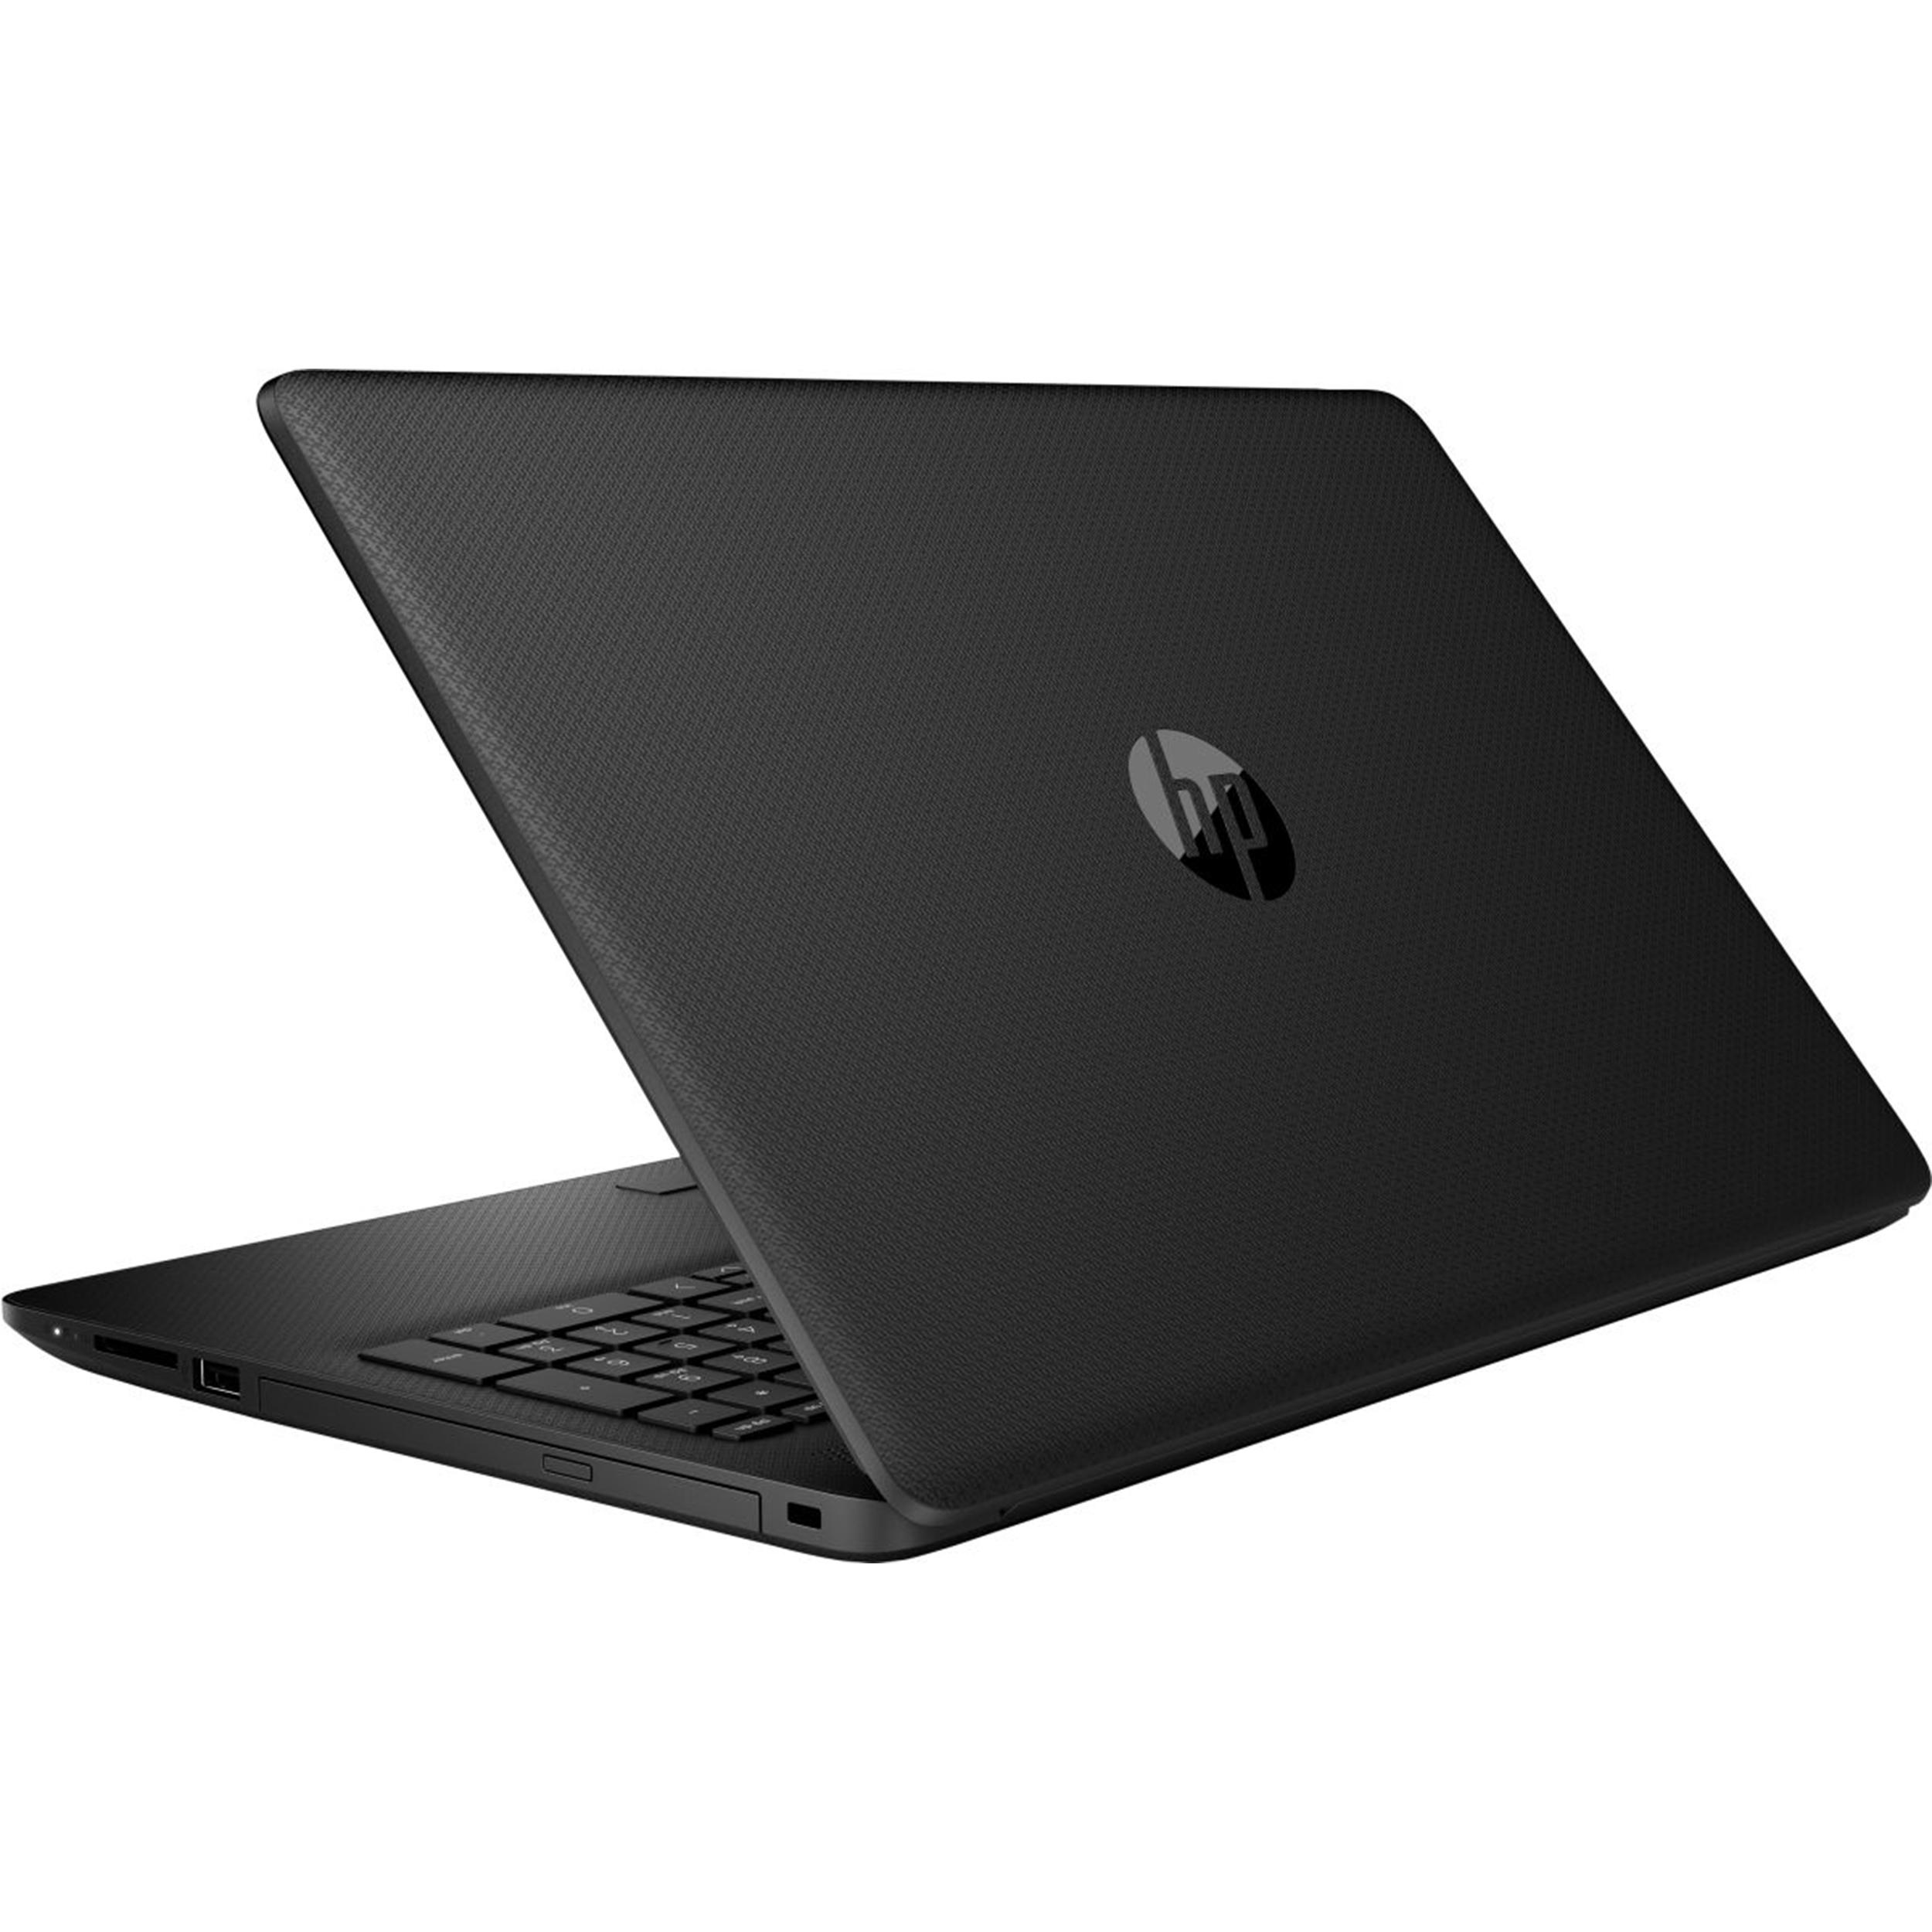 لپ تاپ 15 اینچی اچ پی مدل DA2189-A